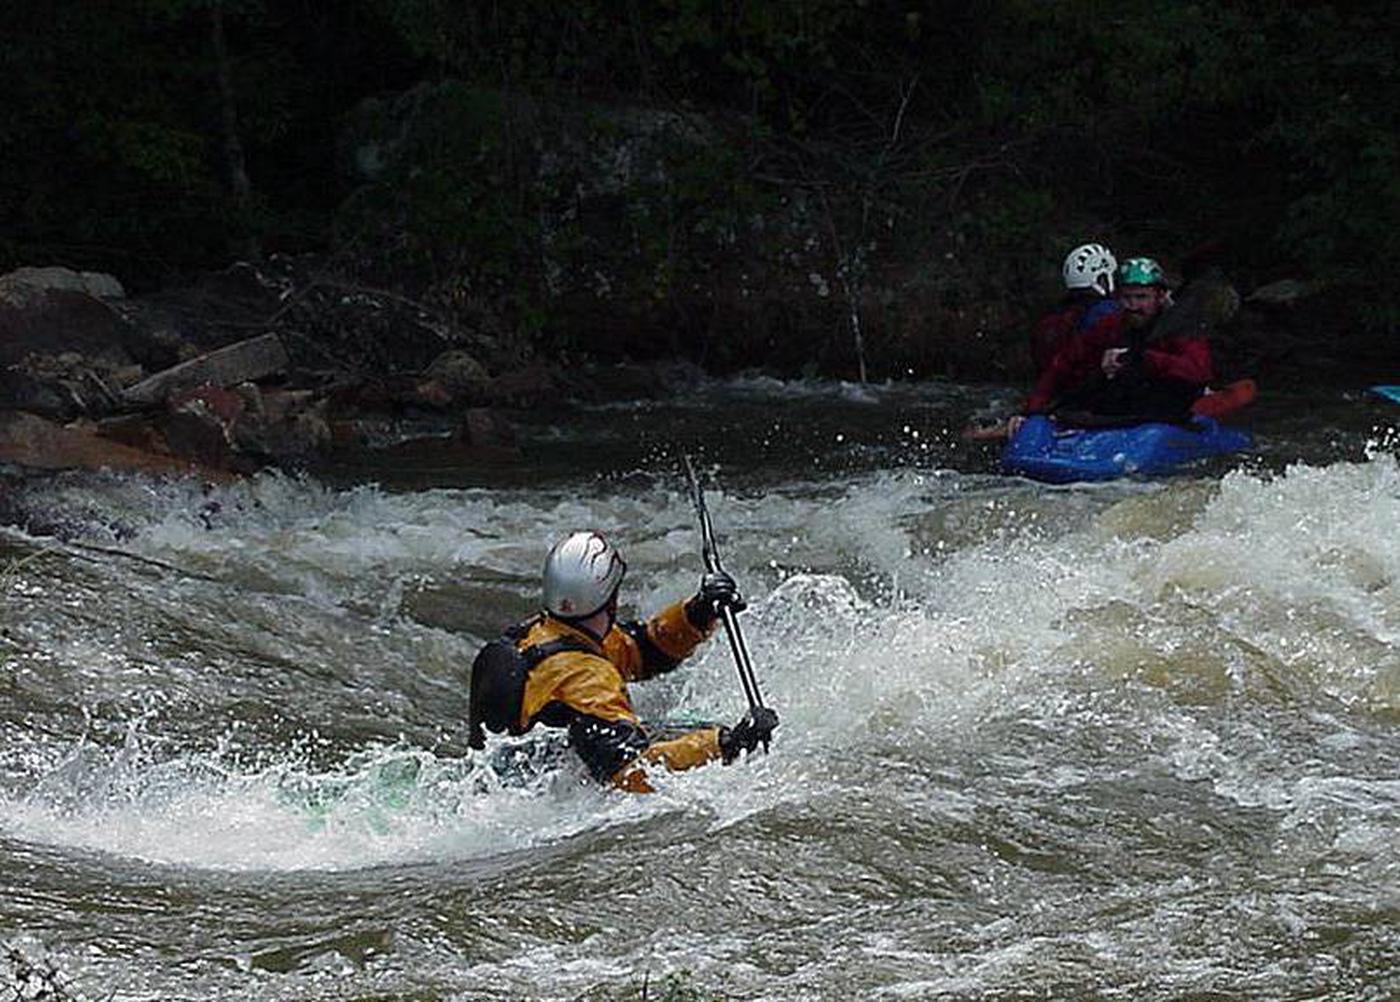 Kayakers @ Horseshoe Bend